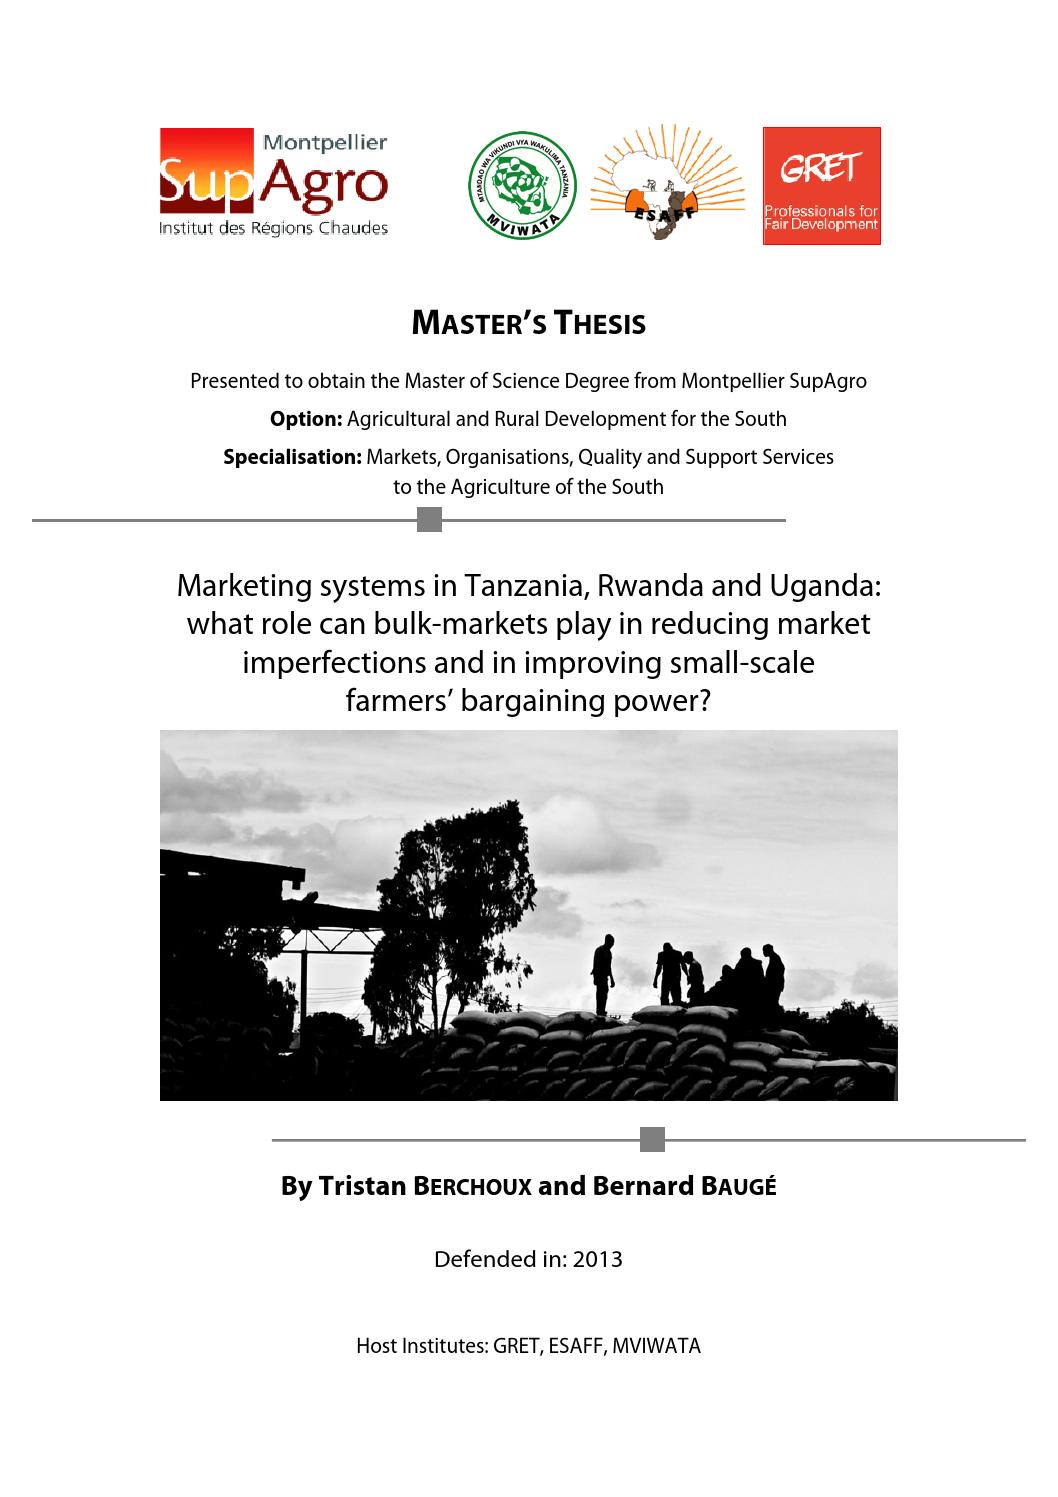 Marketing systems in Tanzania, Rwanda and Uganda: role of